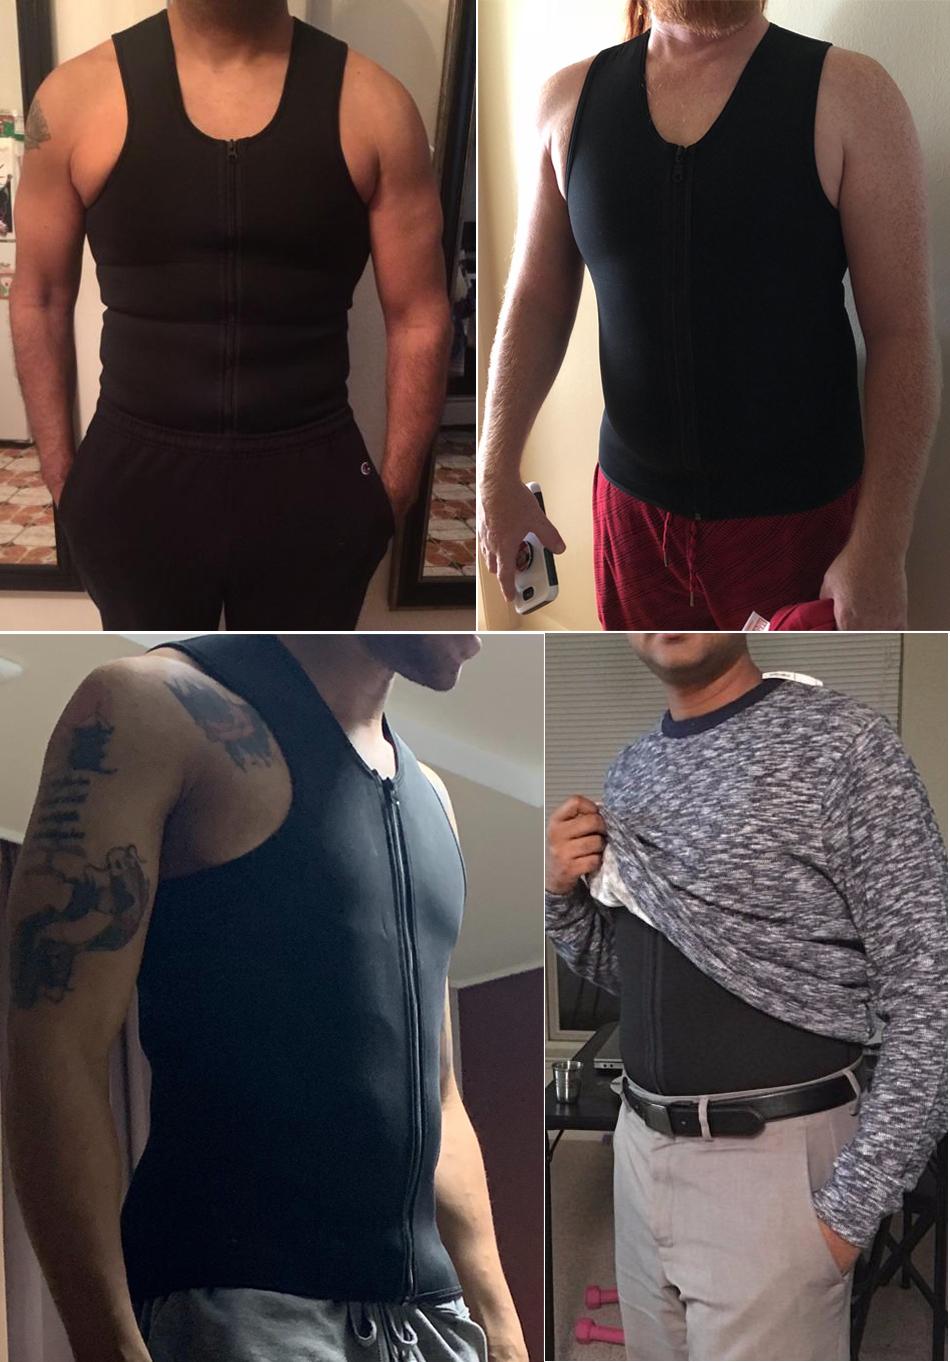 CXZD 2019 Men Waist Trainer Vest for Weightloss Hot Neoprene Corset Body Shaper Zipper Shapewear Slimming Belt Belly Men (9)